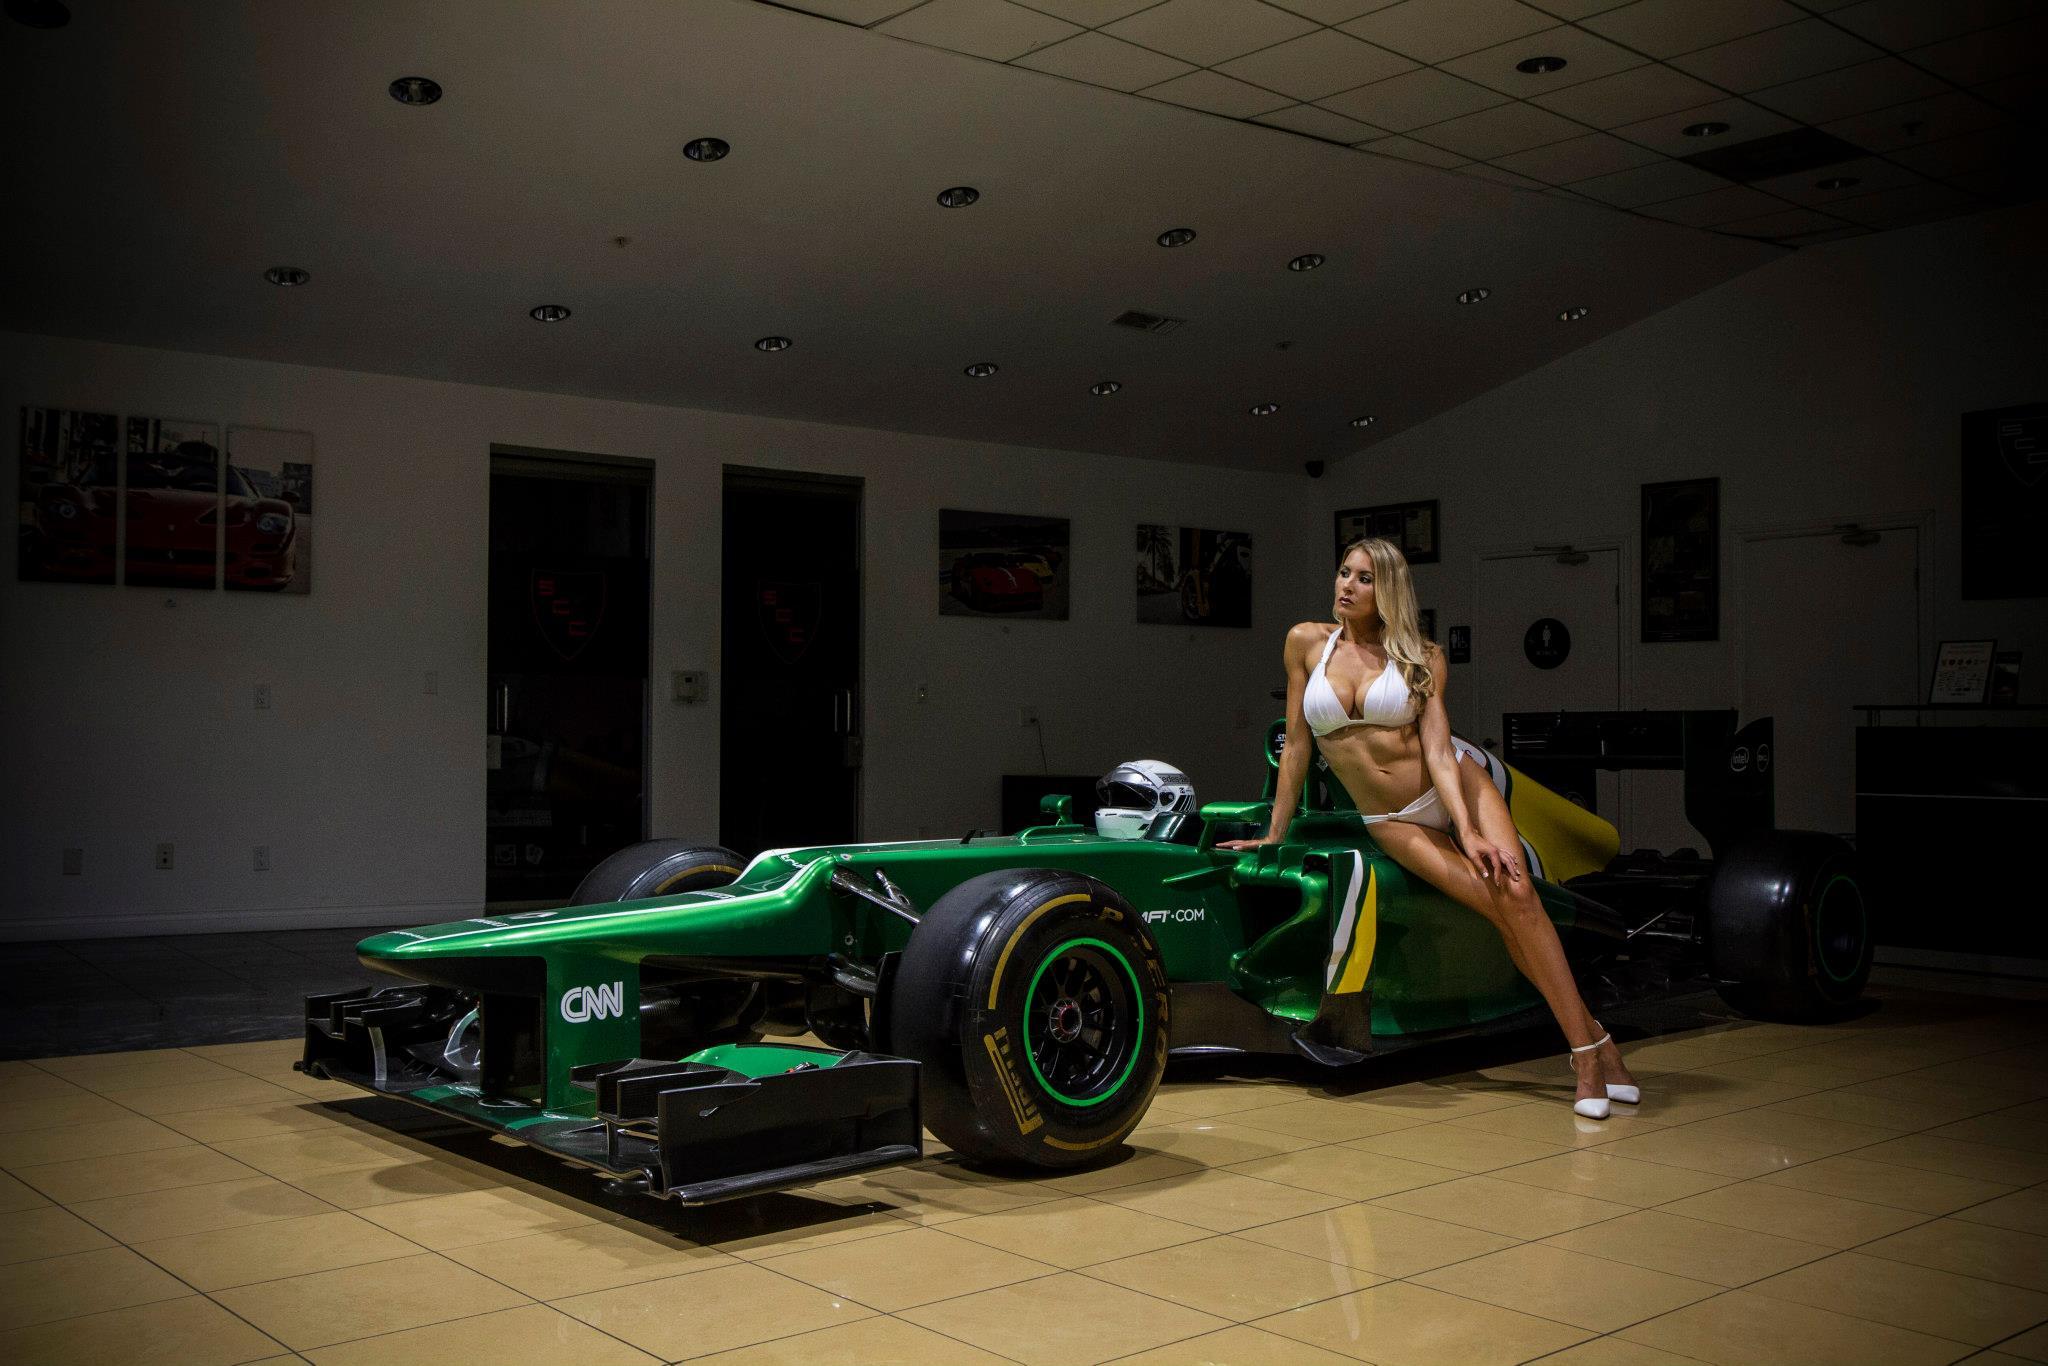 Bikini Blonde Christina Riordan Poses On Caterham Formula